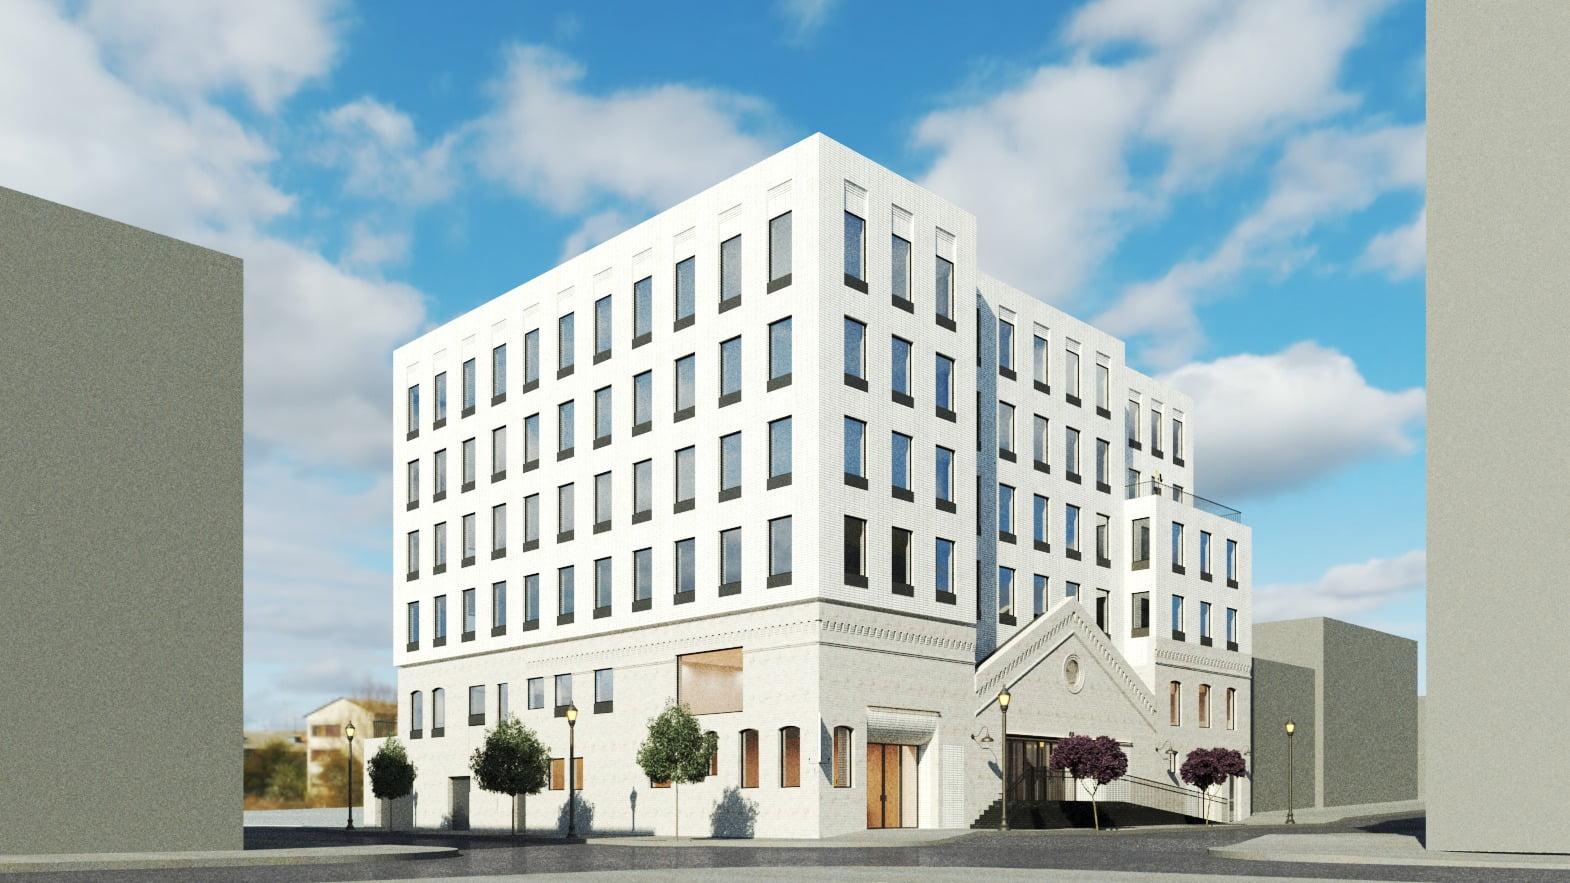 Urban design, Tower block, Cloud, Sky, Building, Property, Window, Condominium, Neighbourhood, Rectangle